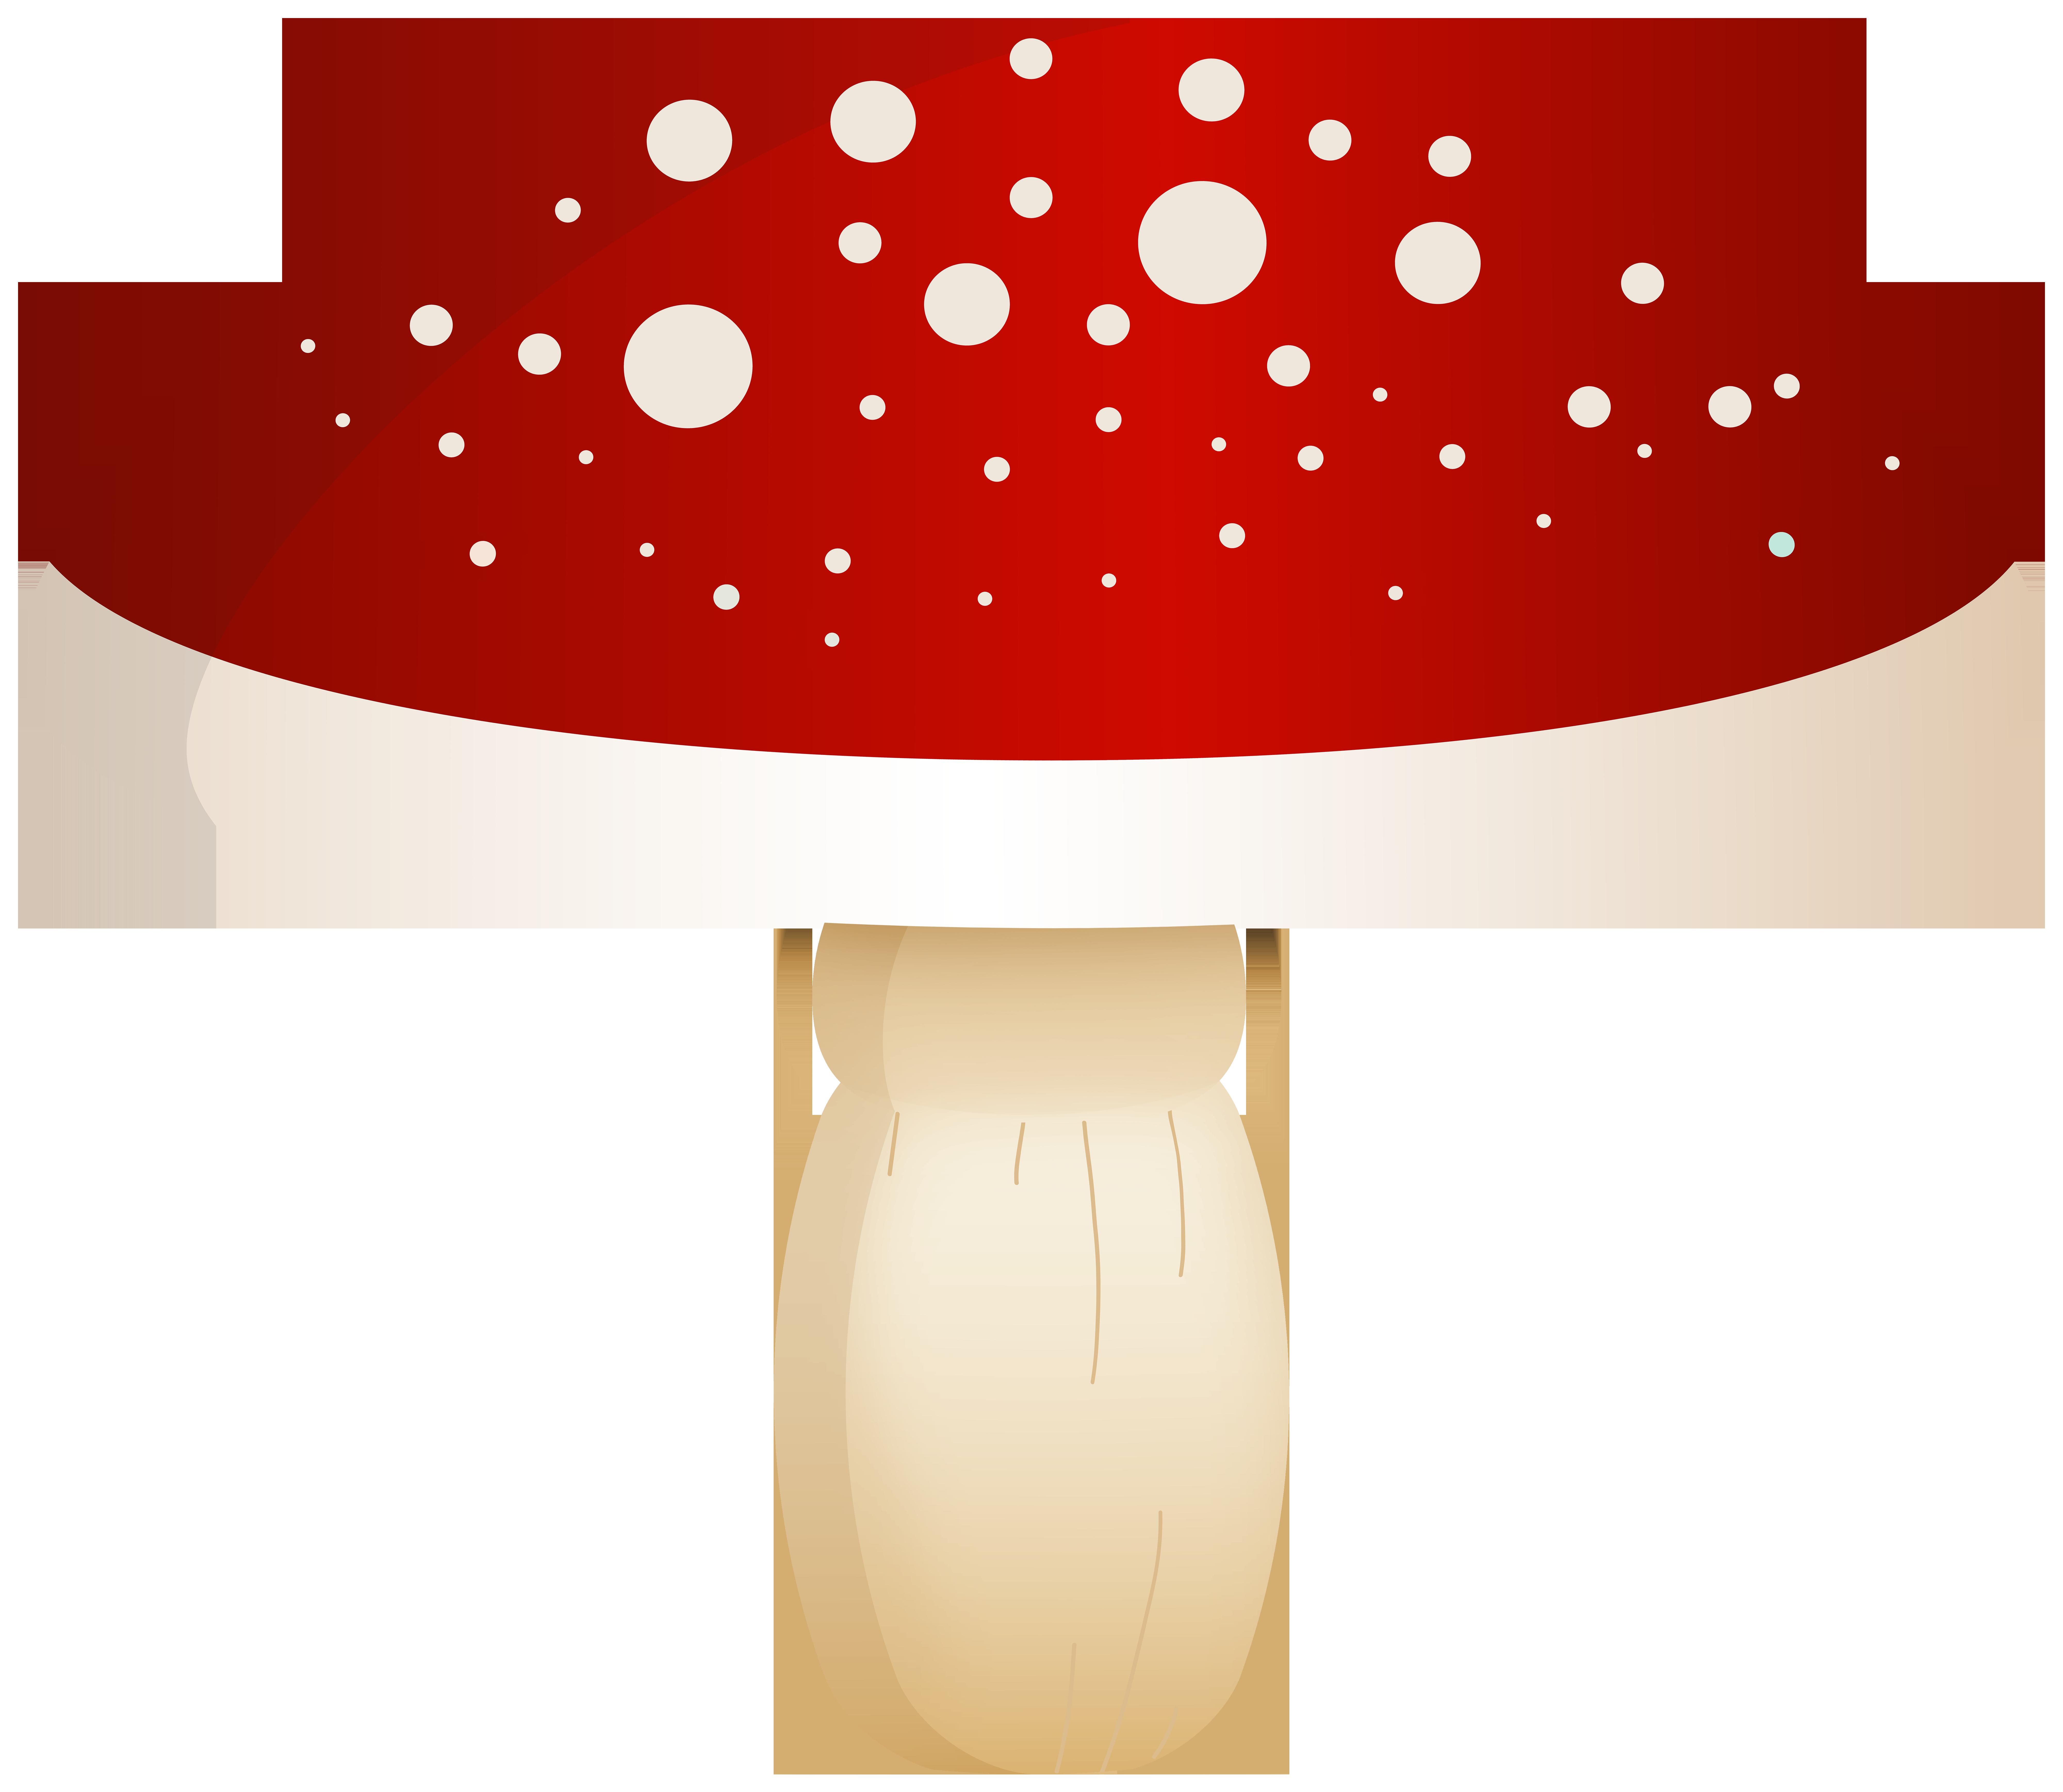 Mushrooms clipart eye. Red mushroom with white